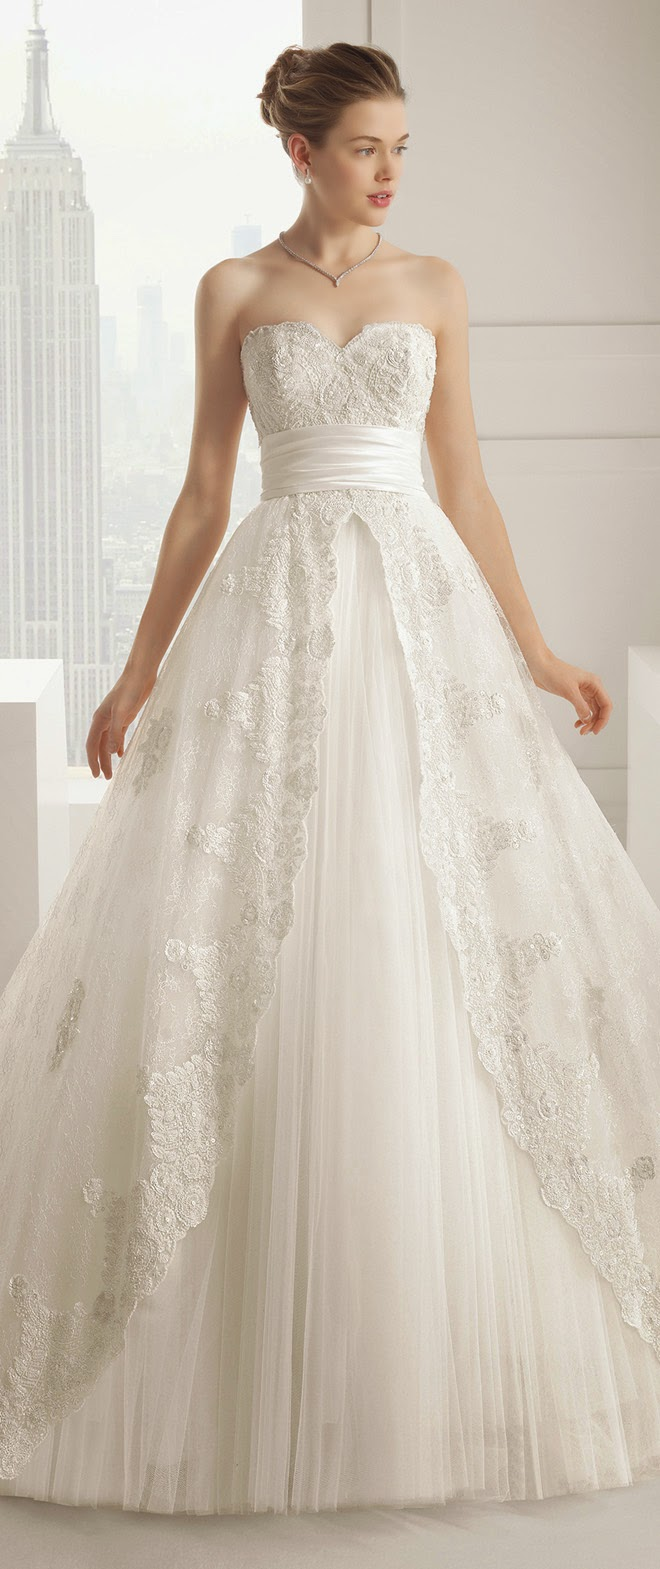 Discount Wedding Dresses Dallas 94 Fancy Please contact Rosa Clara